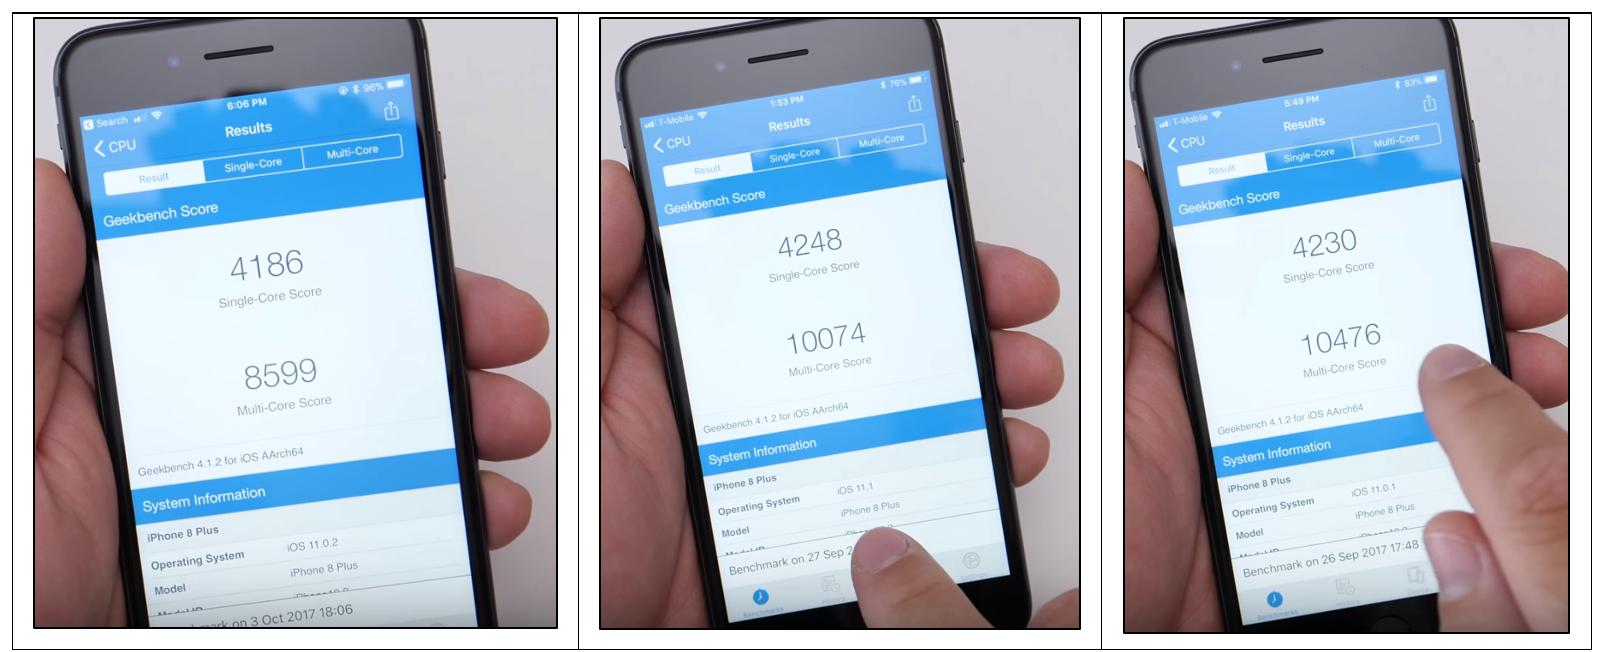 Geekbench Scores for iOS 11.0.2